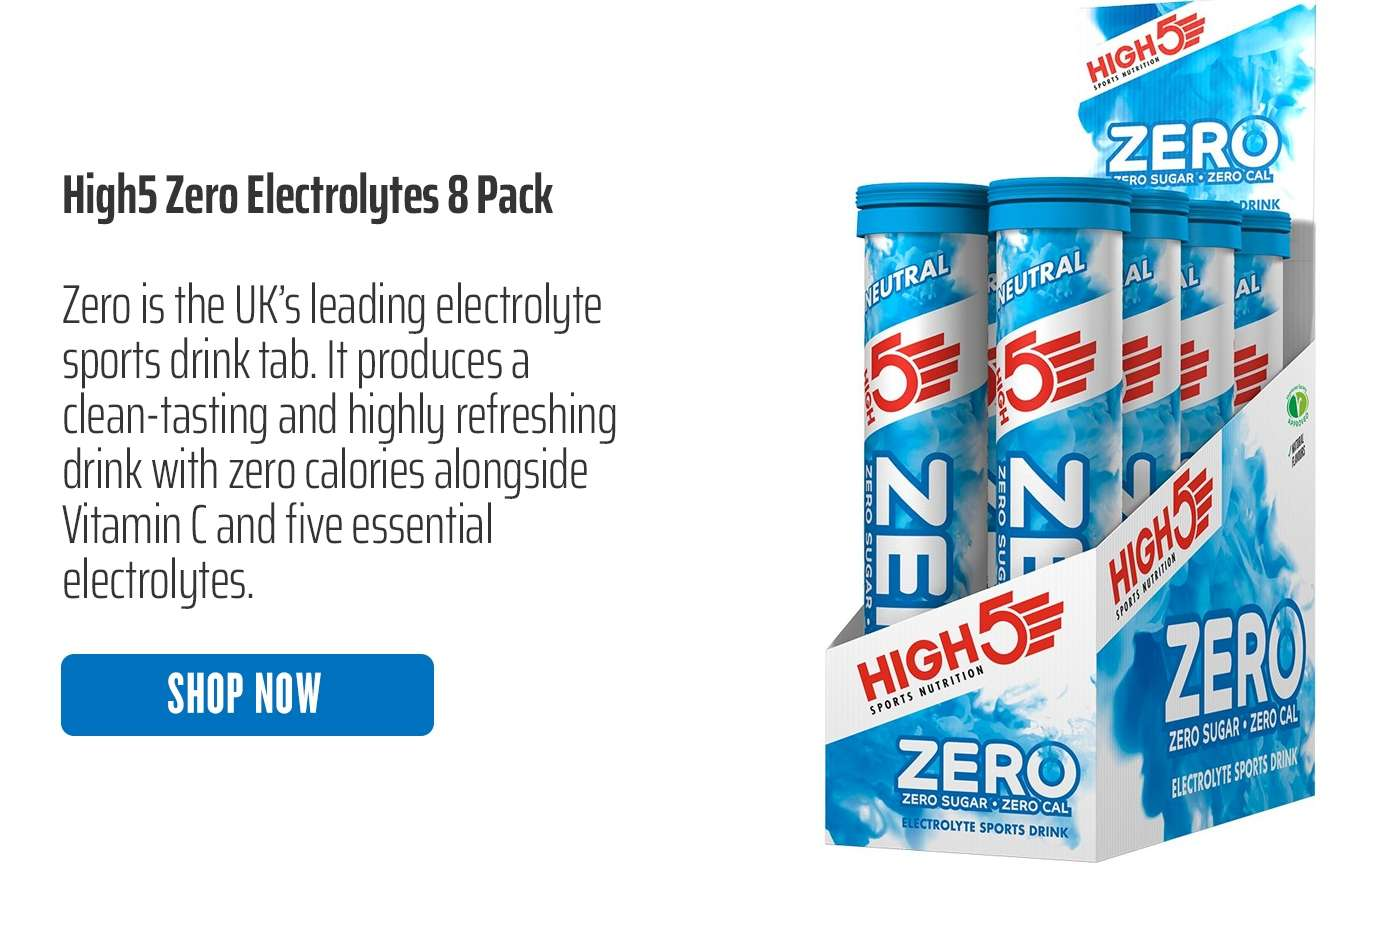 High5 Zero Electrolytes 8 Pack